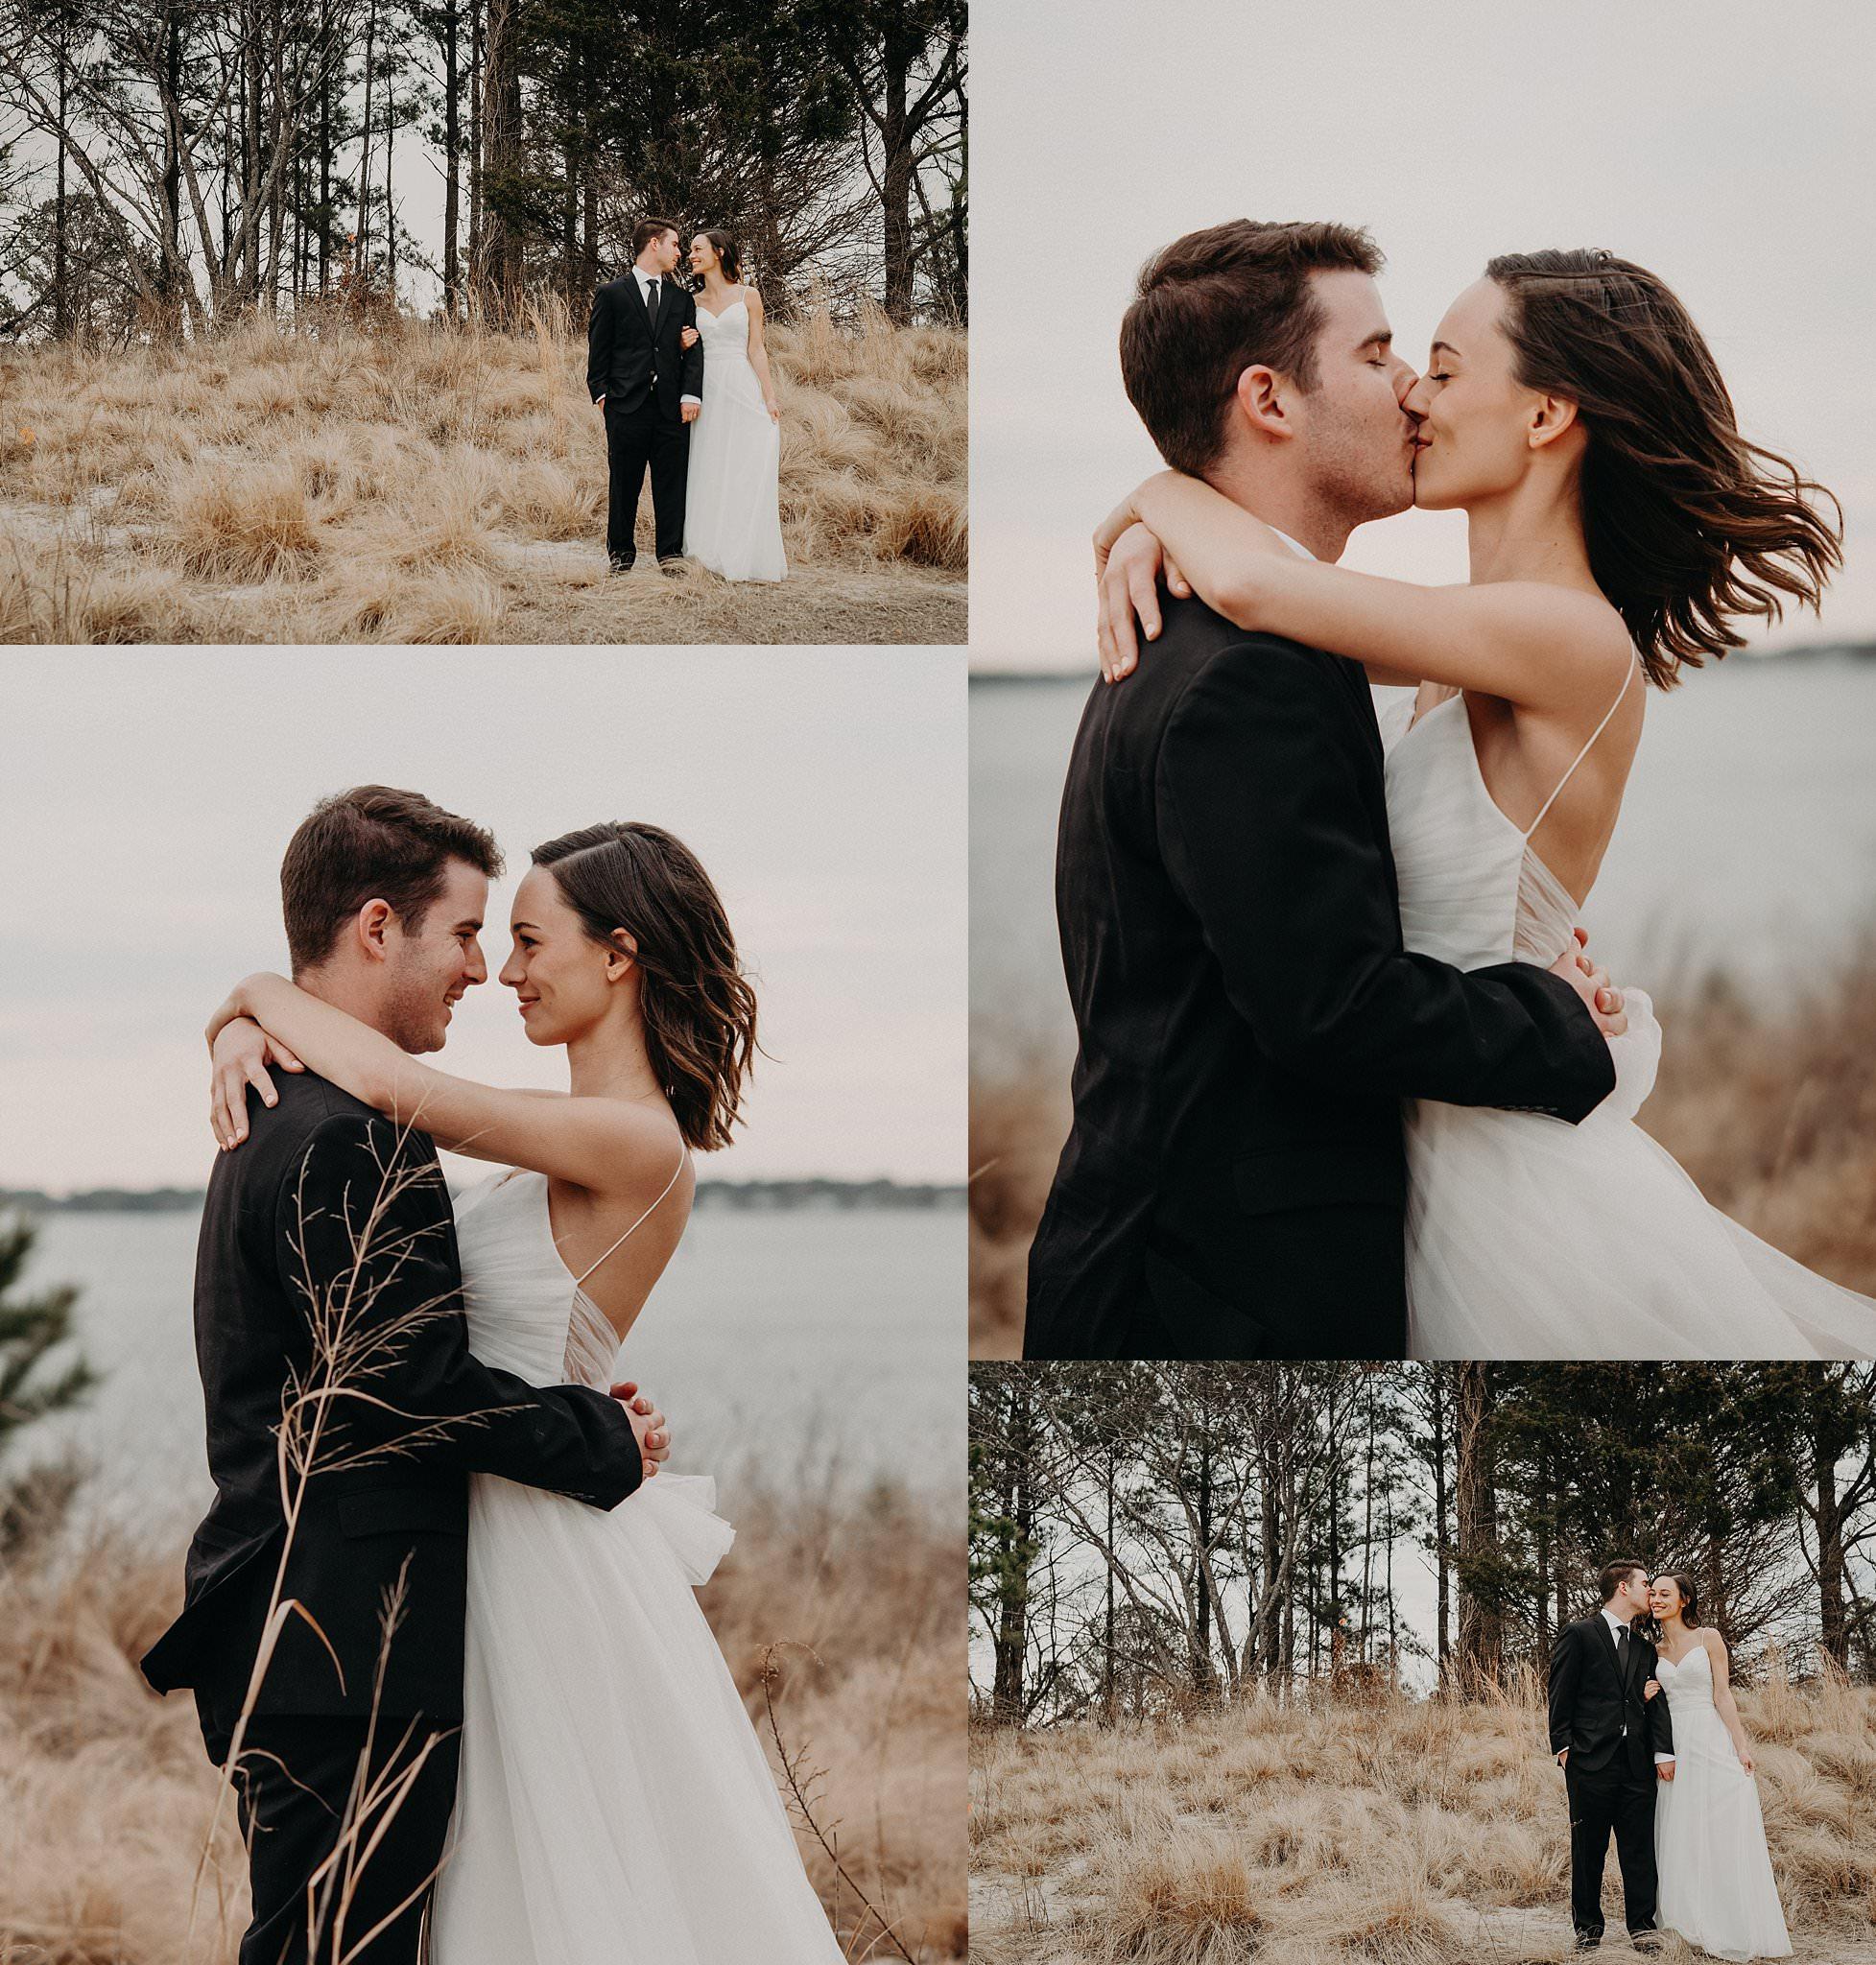 Norfolk-Elopement-Session-Bride-groom-at-natural-park-melissa-bliss-photography-VA-wedding-photographer.jpg